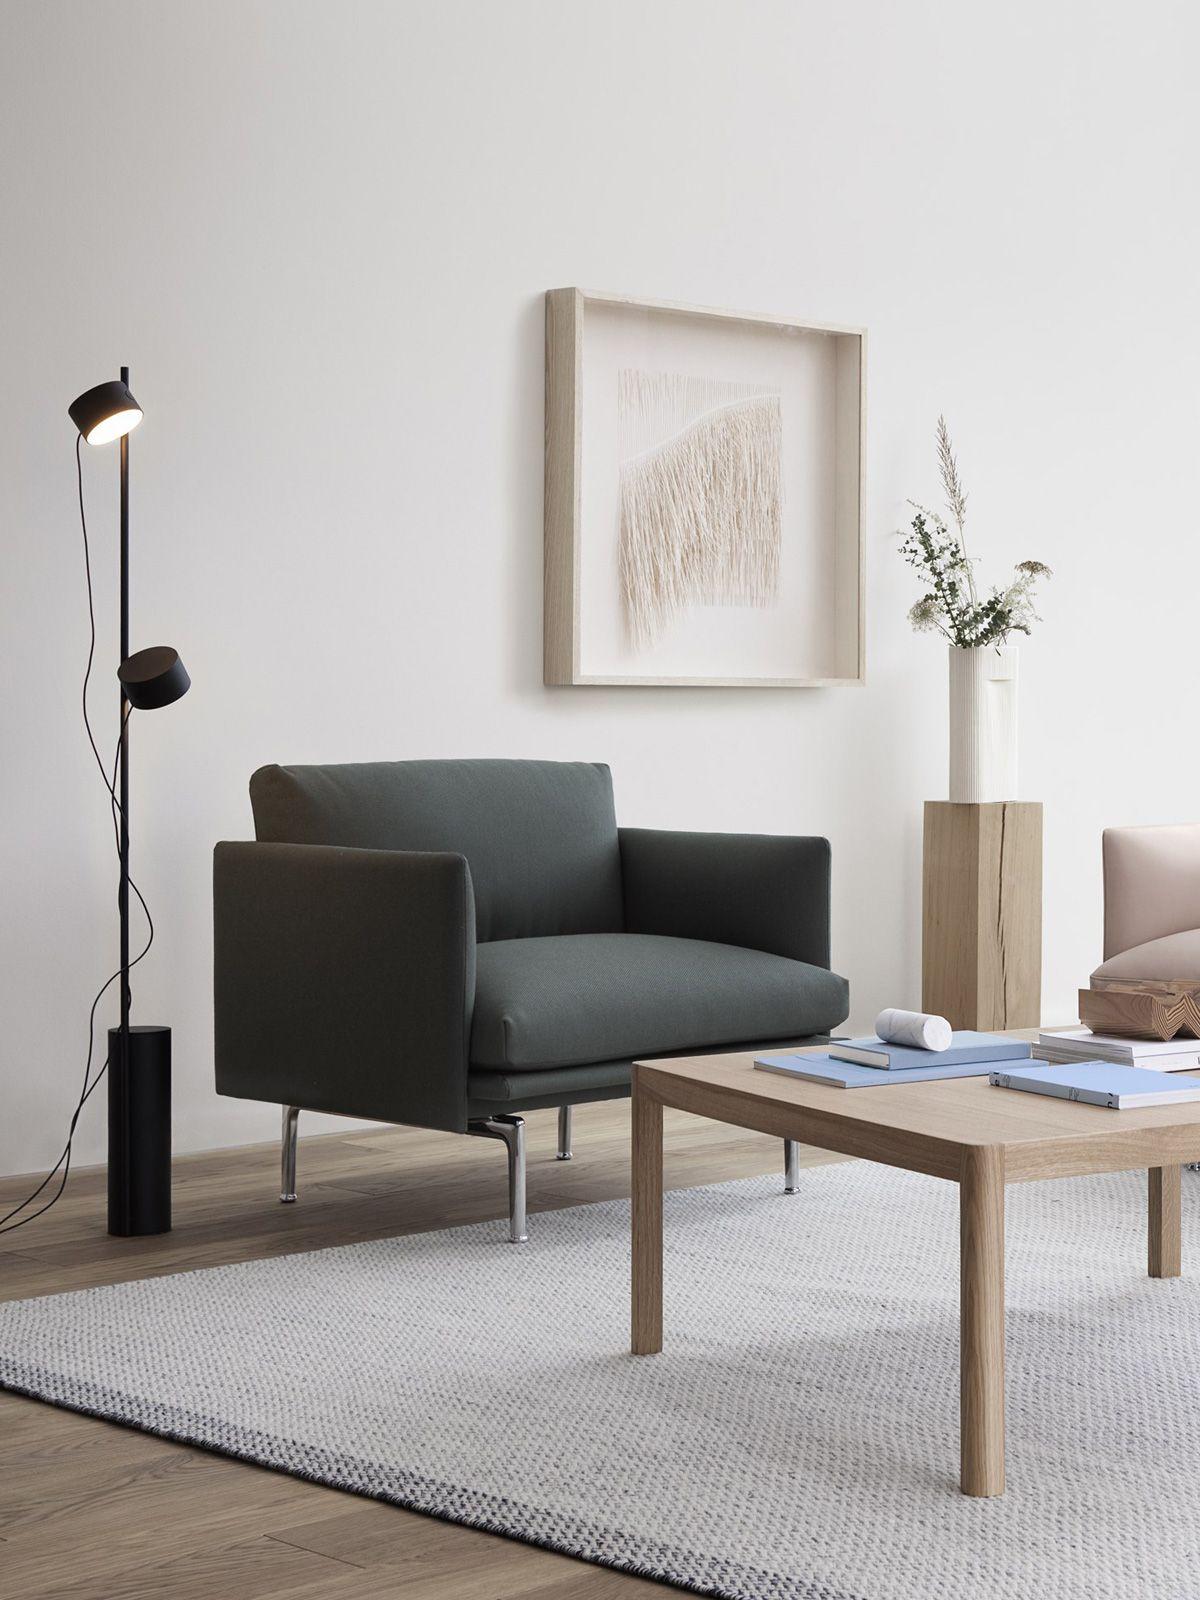 Post Lamp Floor - DesignOrt.com in 2020   Wohnzimmertische ...